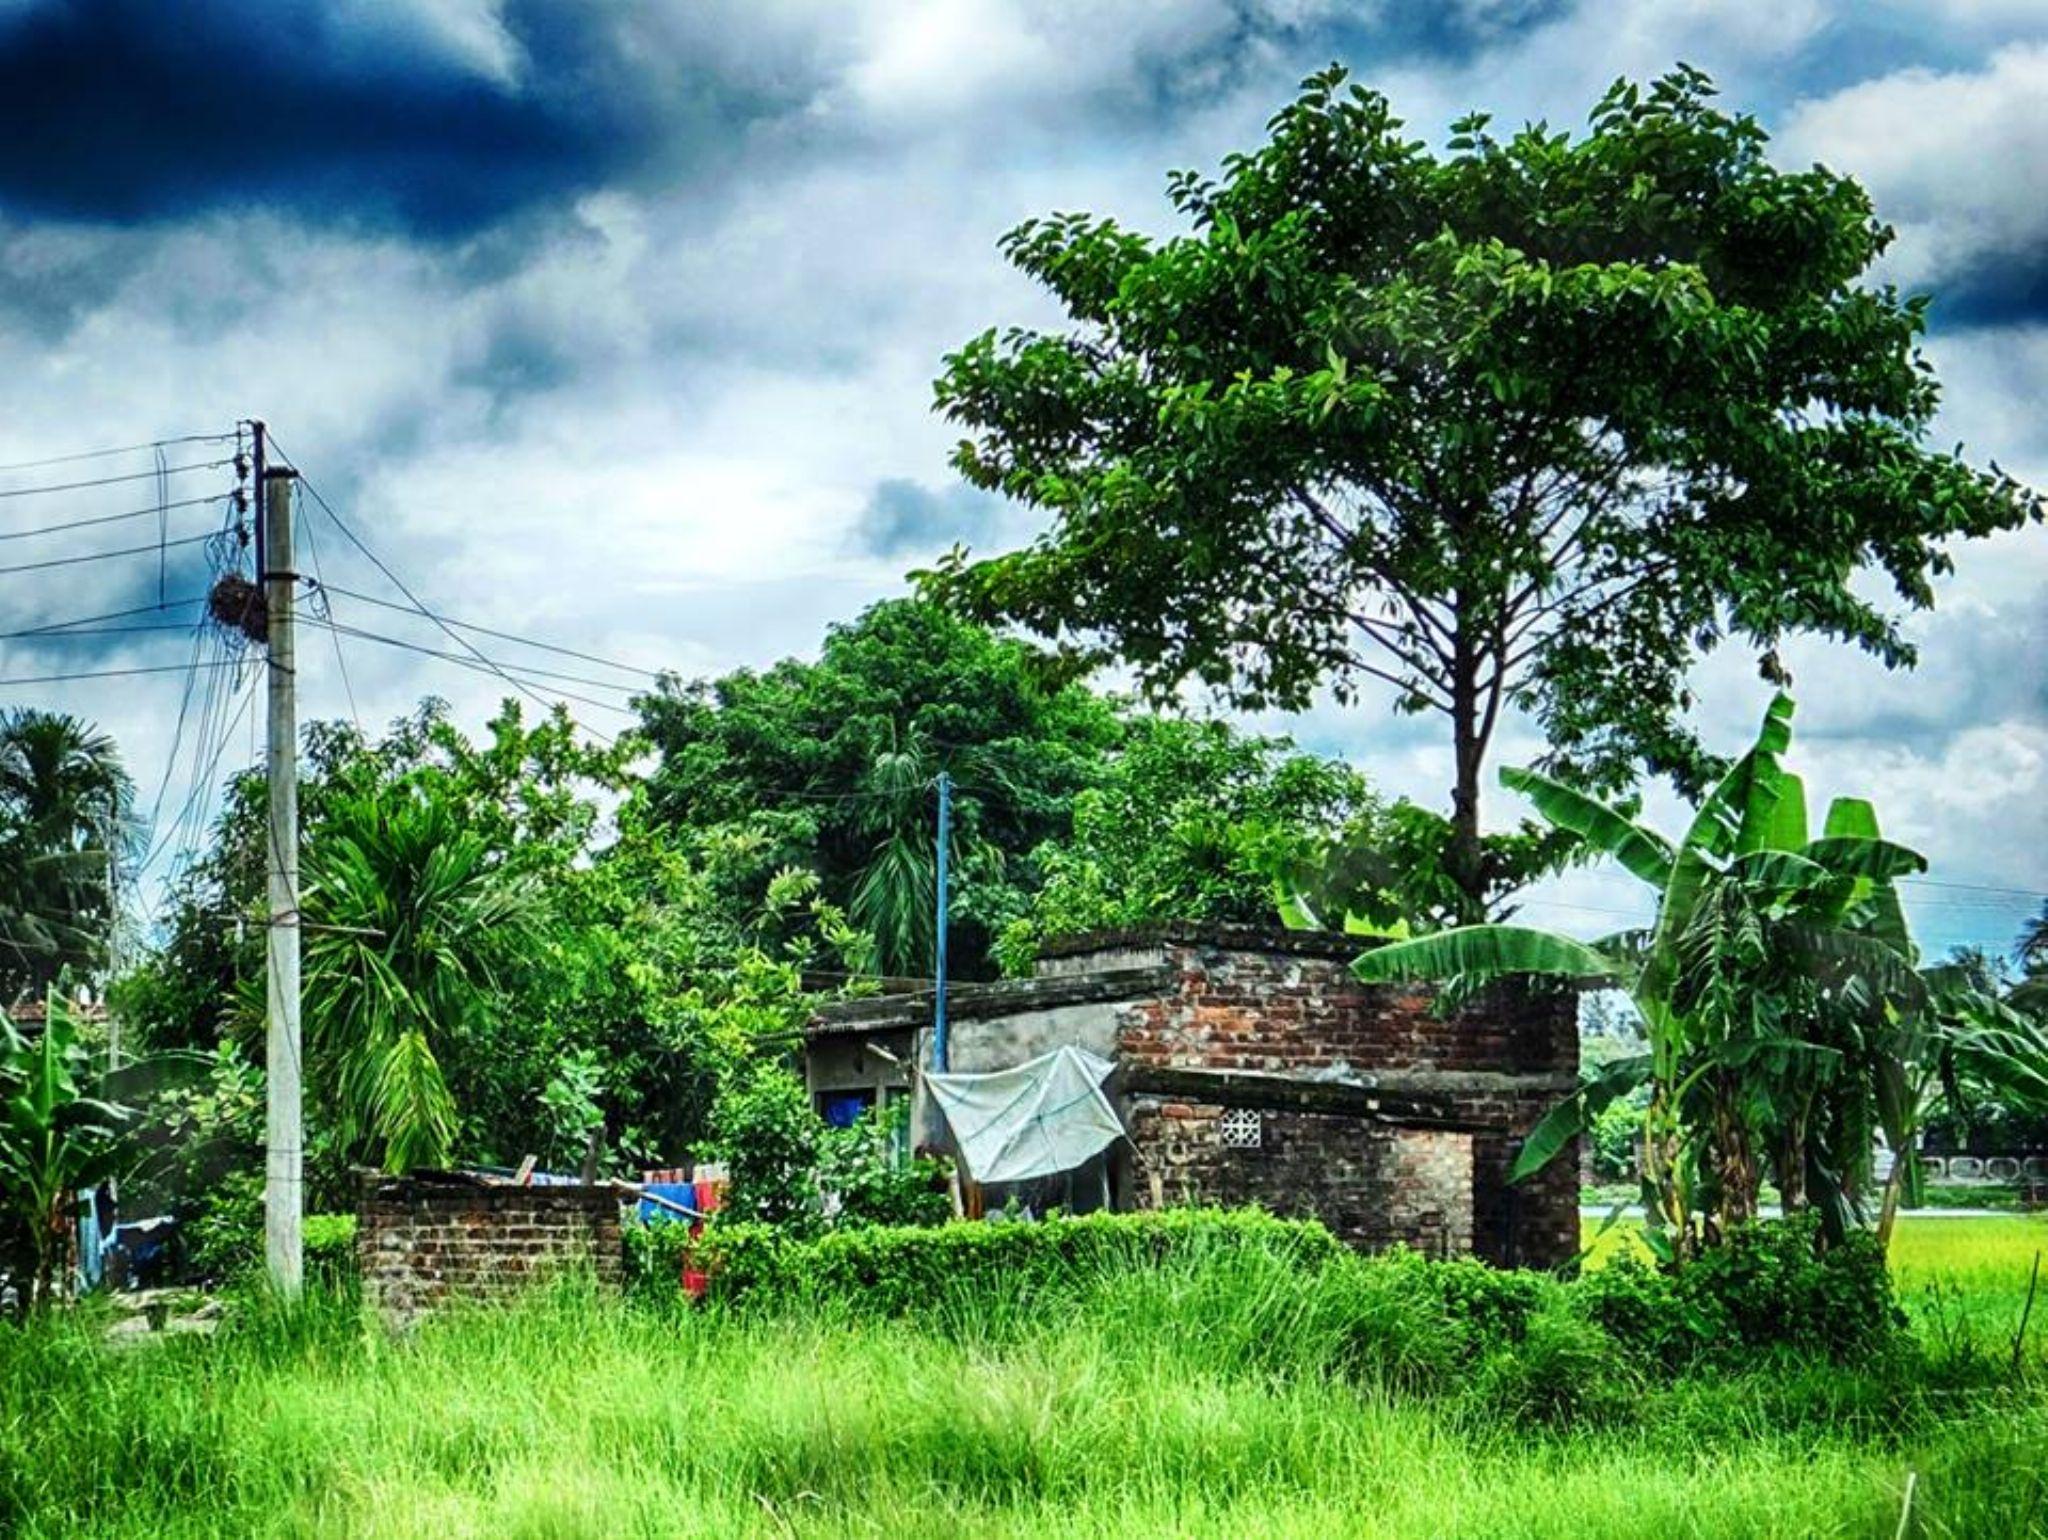 Alone by Subhrajyoti Guha